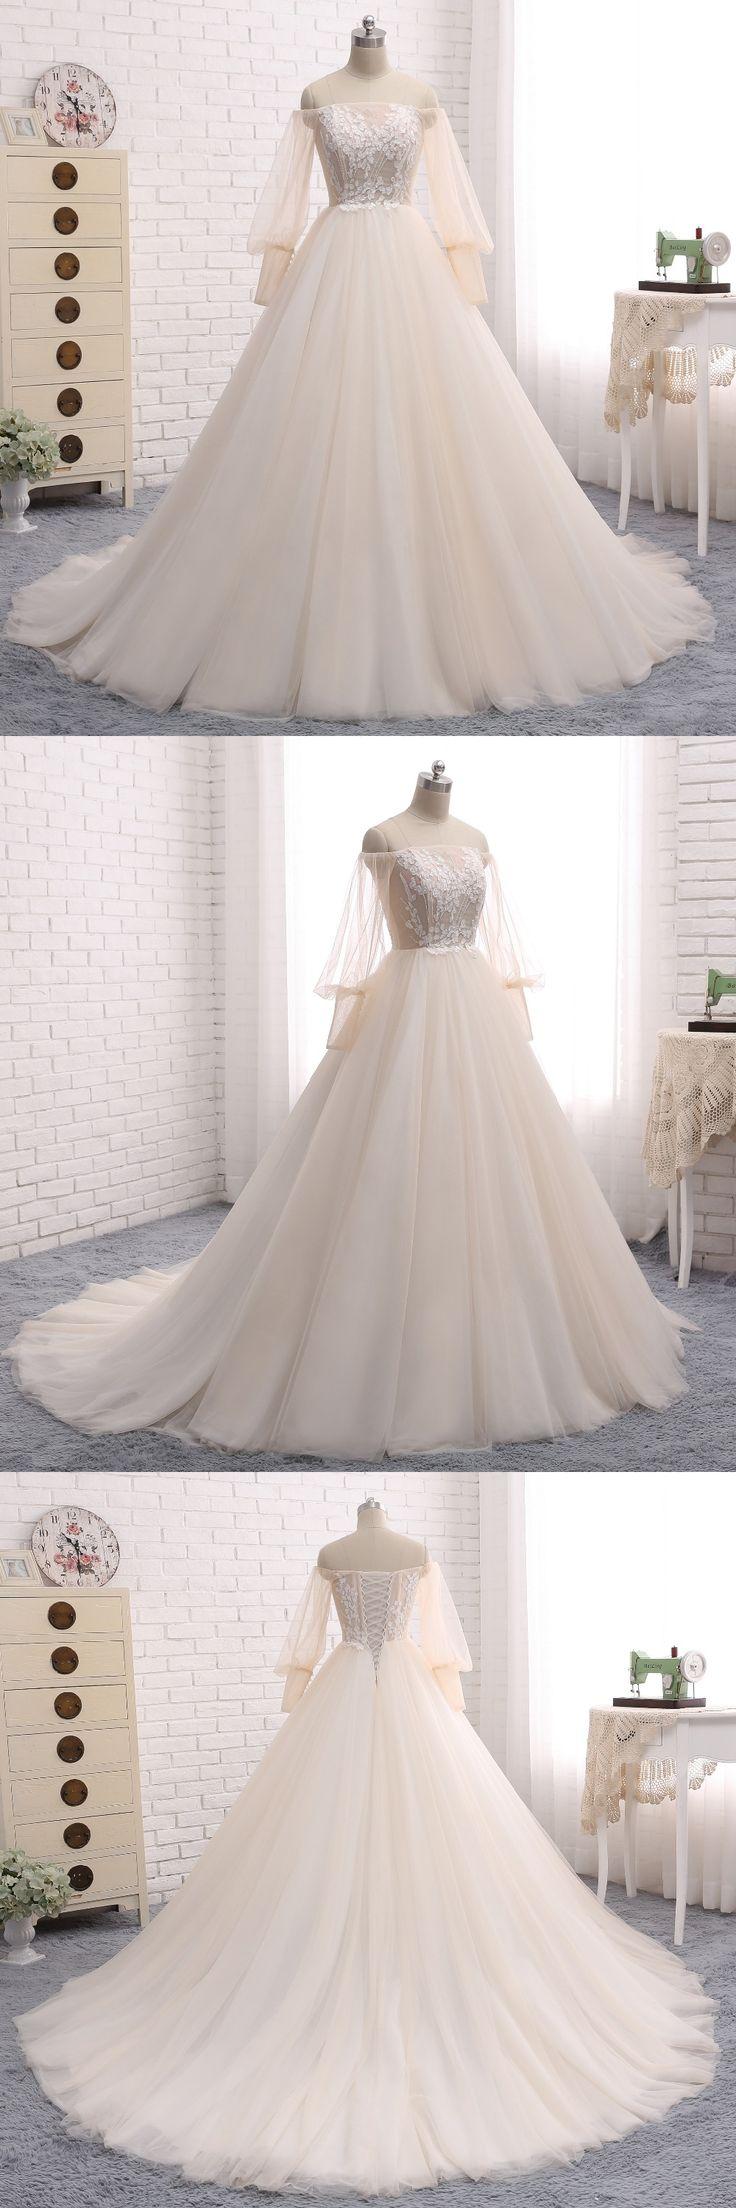 best cheap wedding dresses images on pinterest short wedding